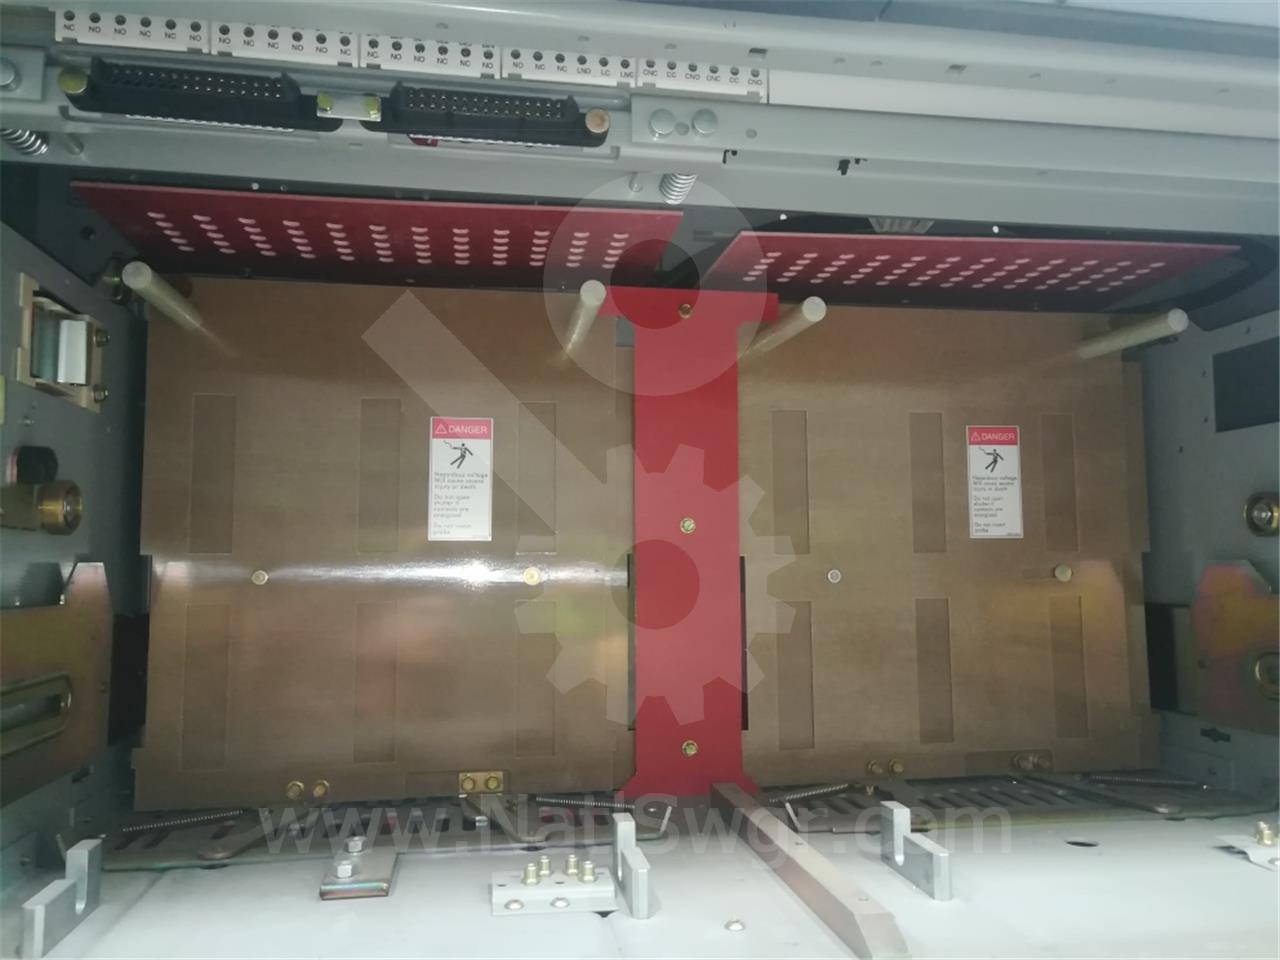 MDSHTR350WL Cutler-Hammer DOUBLE CASSETTE SHUTTER ASSEMBLY FOR MDS 4000-5000A, 6 POLE